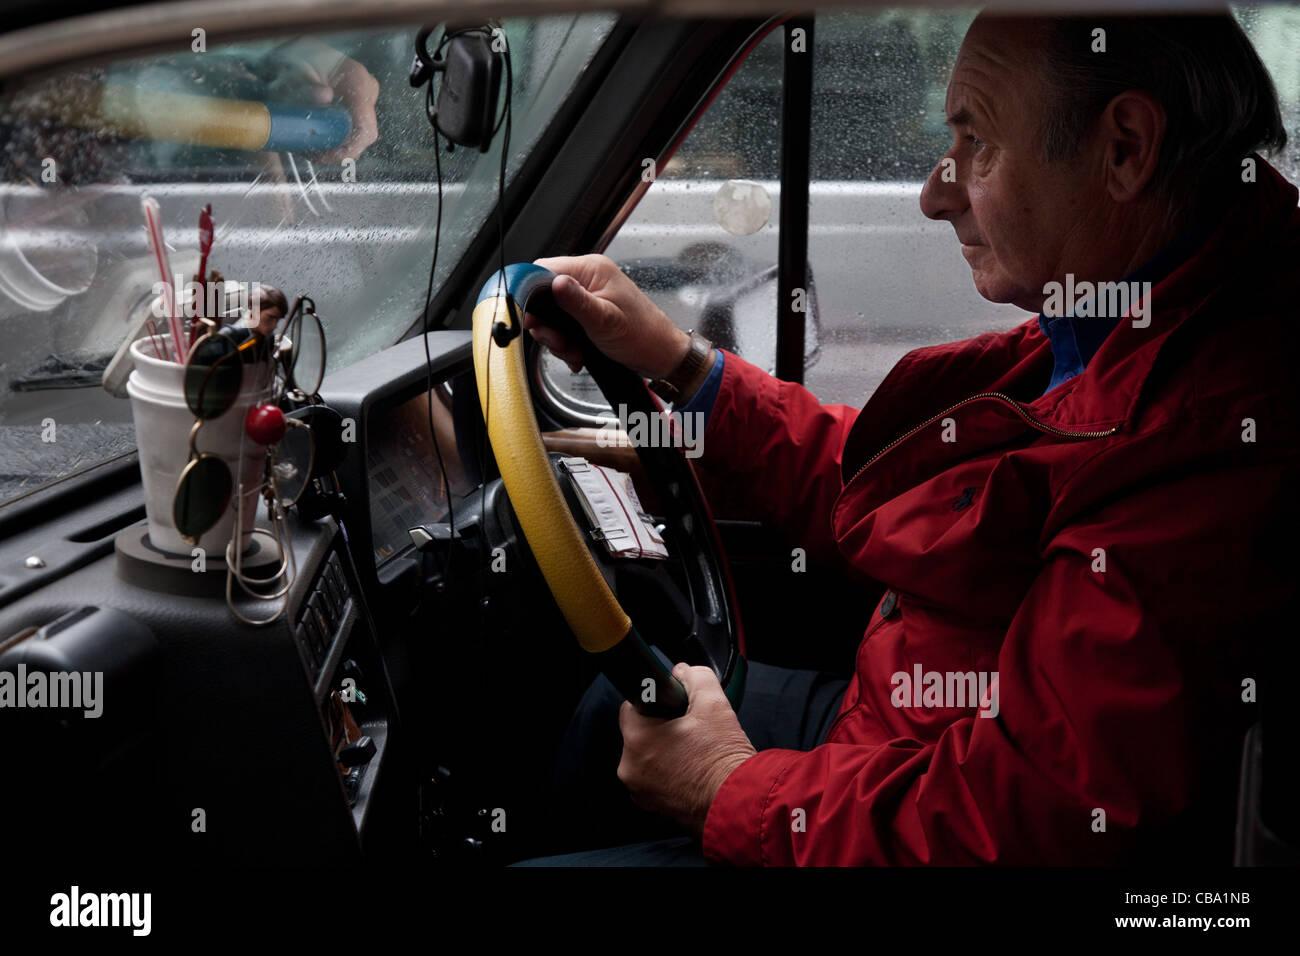 Un taxista de Londres, Londres, Reino Unido. Foto de stock